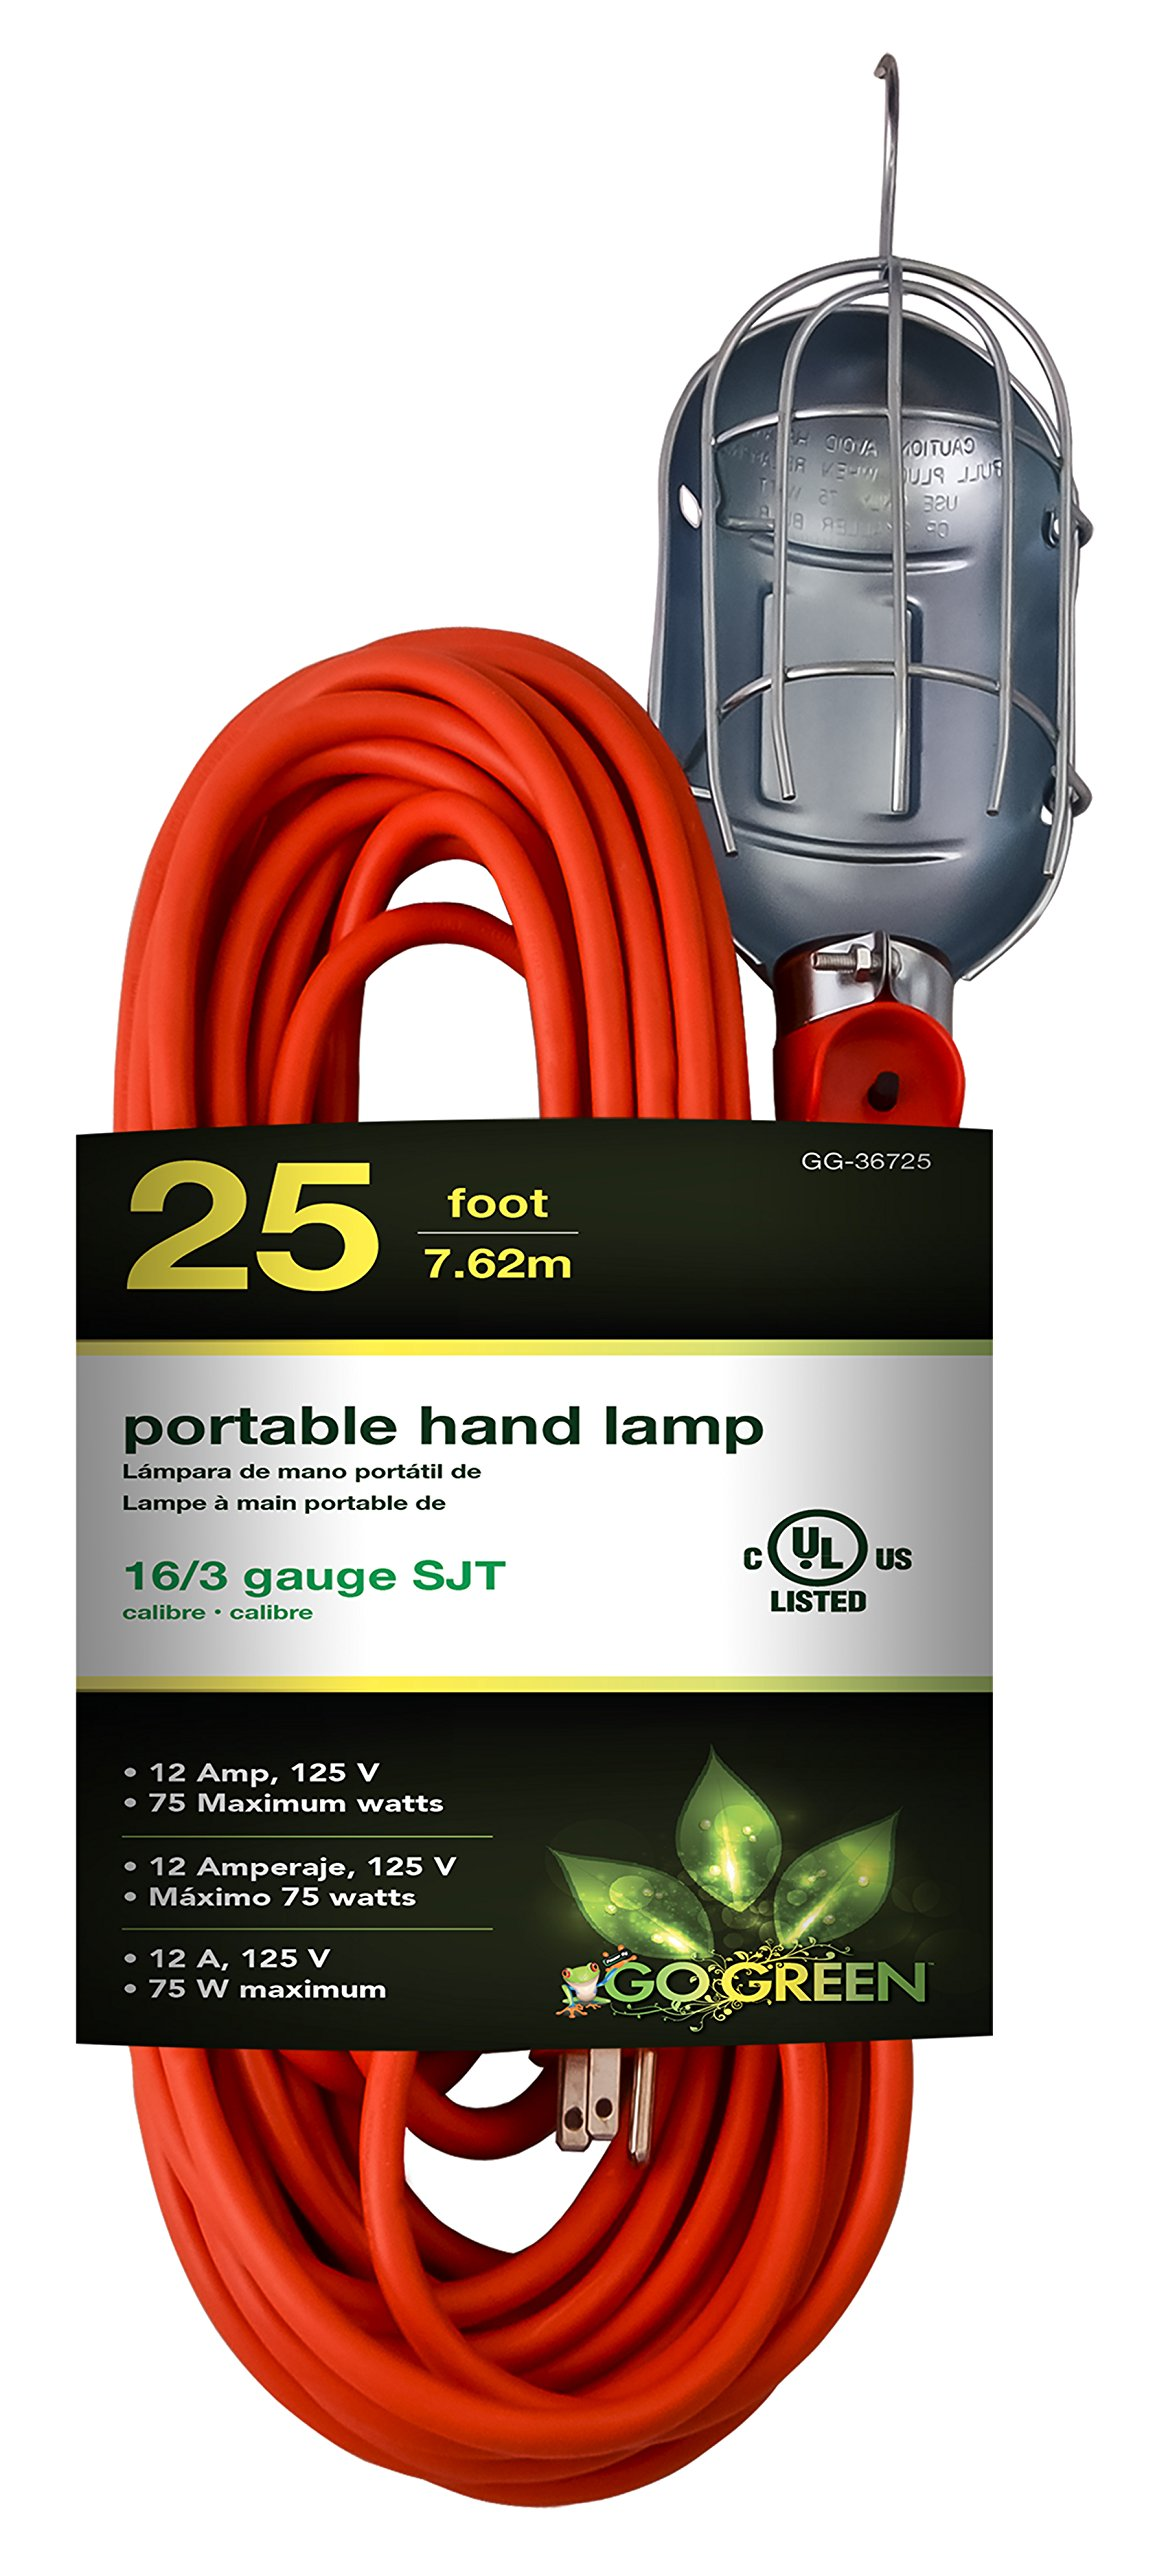 GoGreen Power GG-36725 16/3 25' Portable Hand Lamp